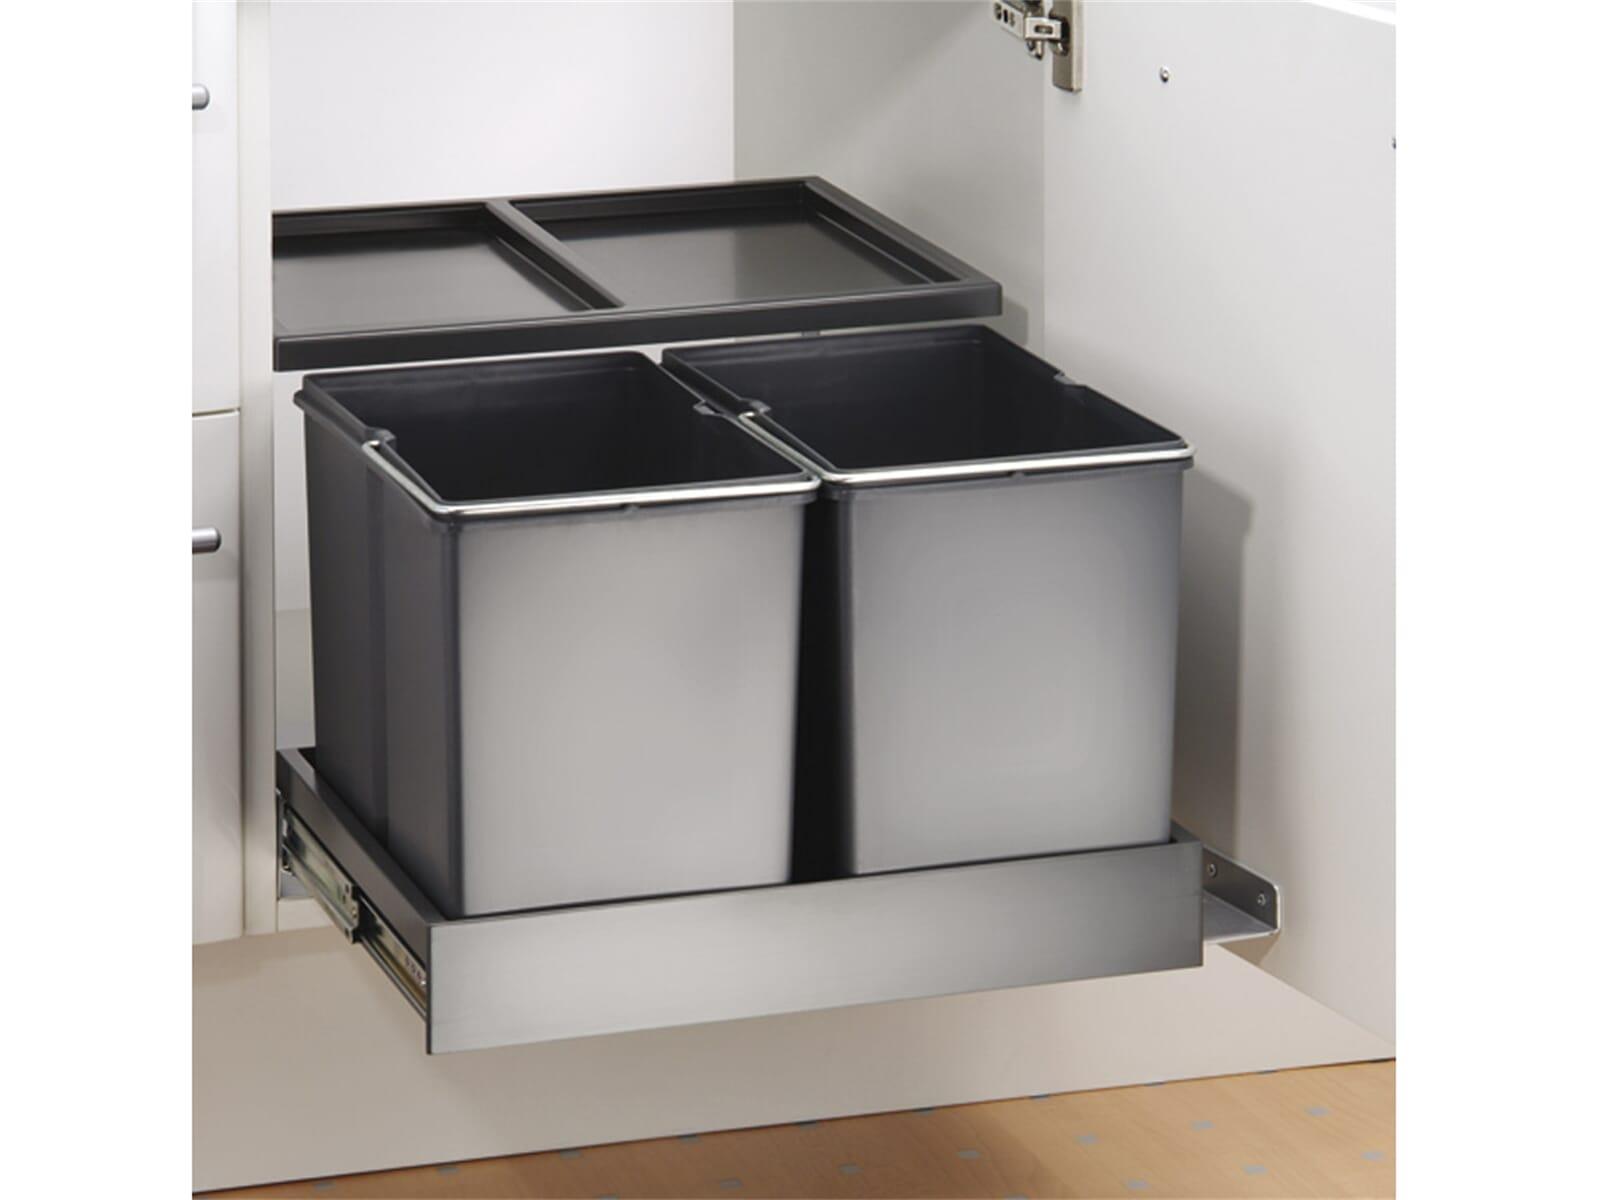 naber double shorty plus einbau abfallsammler f r 124 90. Black Bedroom Furniture Sets. Home Design Ideas